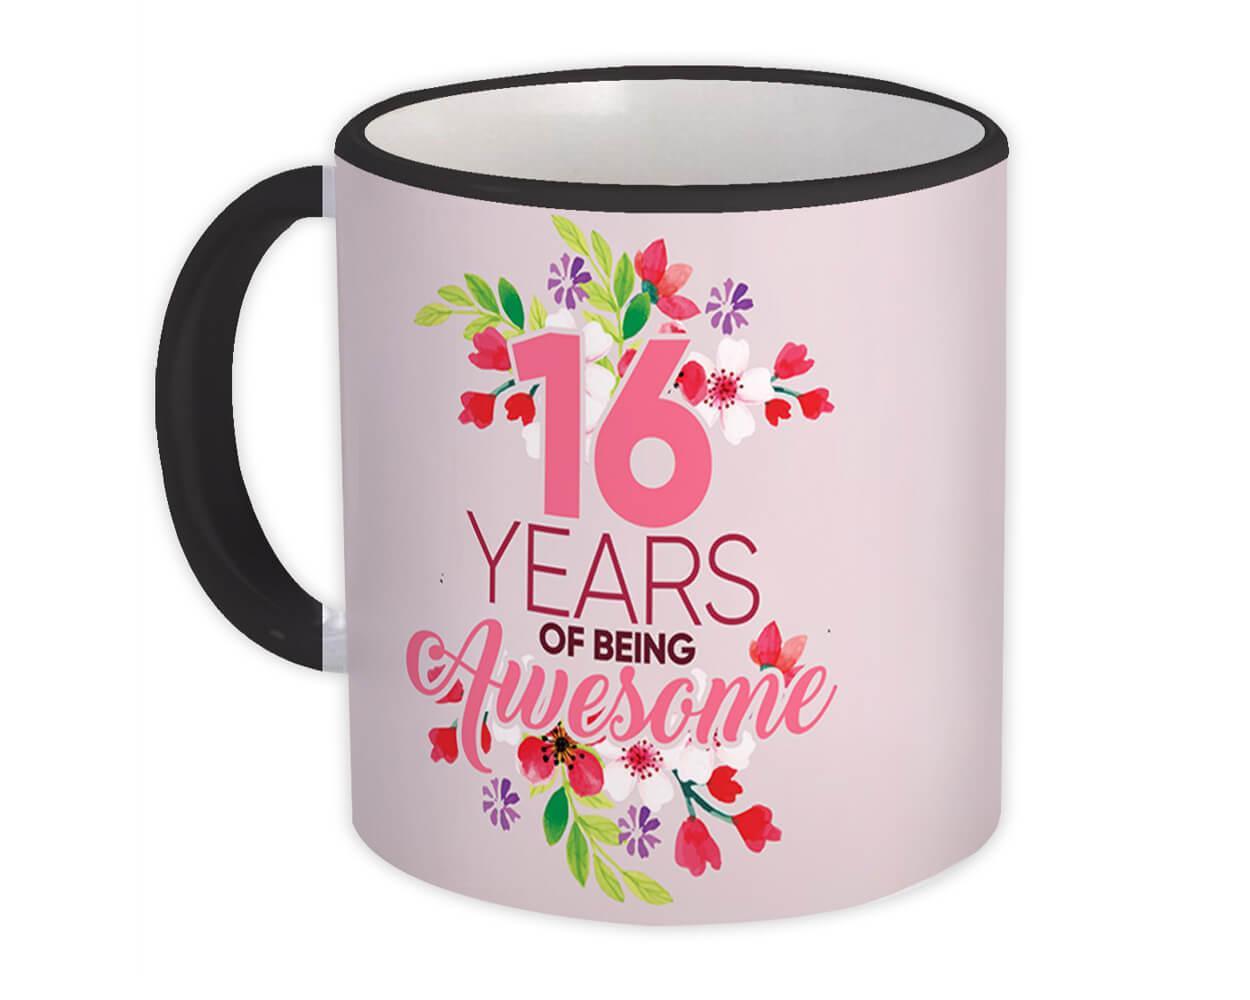 16 Years of Being Awesome : Gift Mug 16th Birthday Flower Girl Female Women Happy Cute